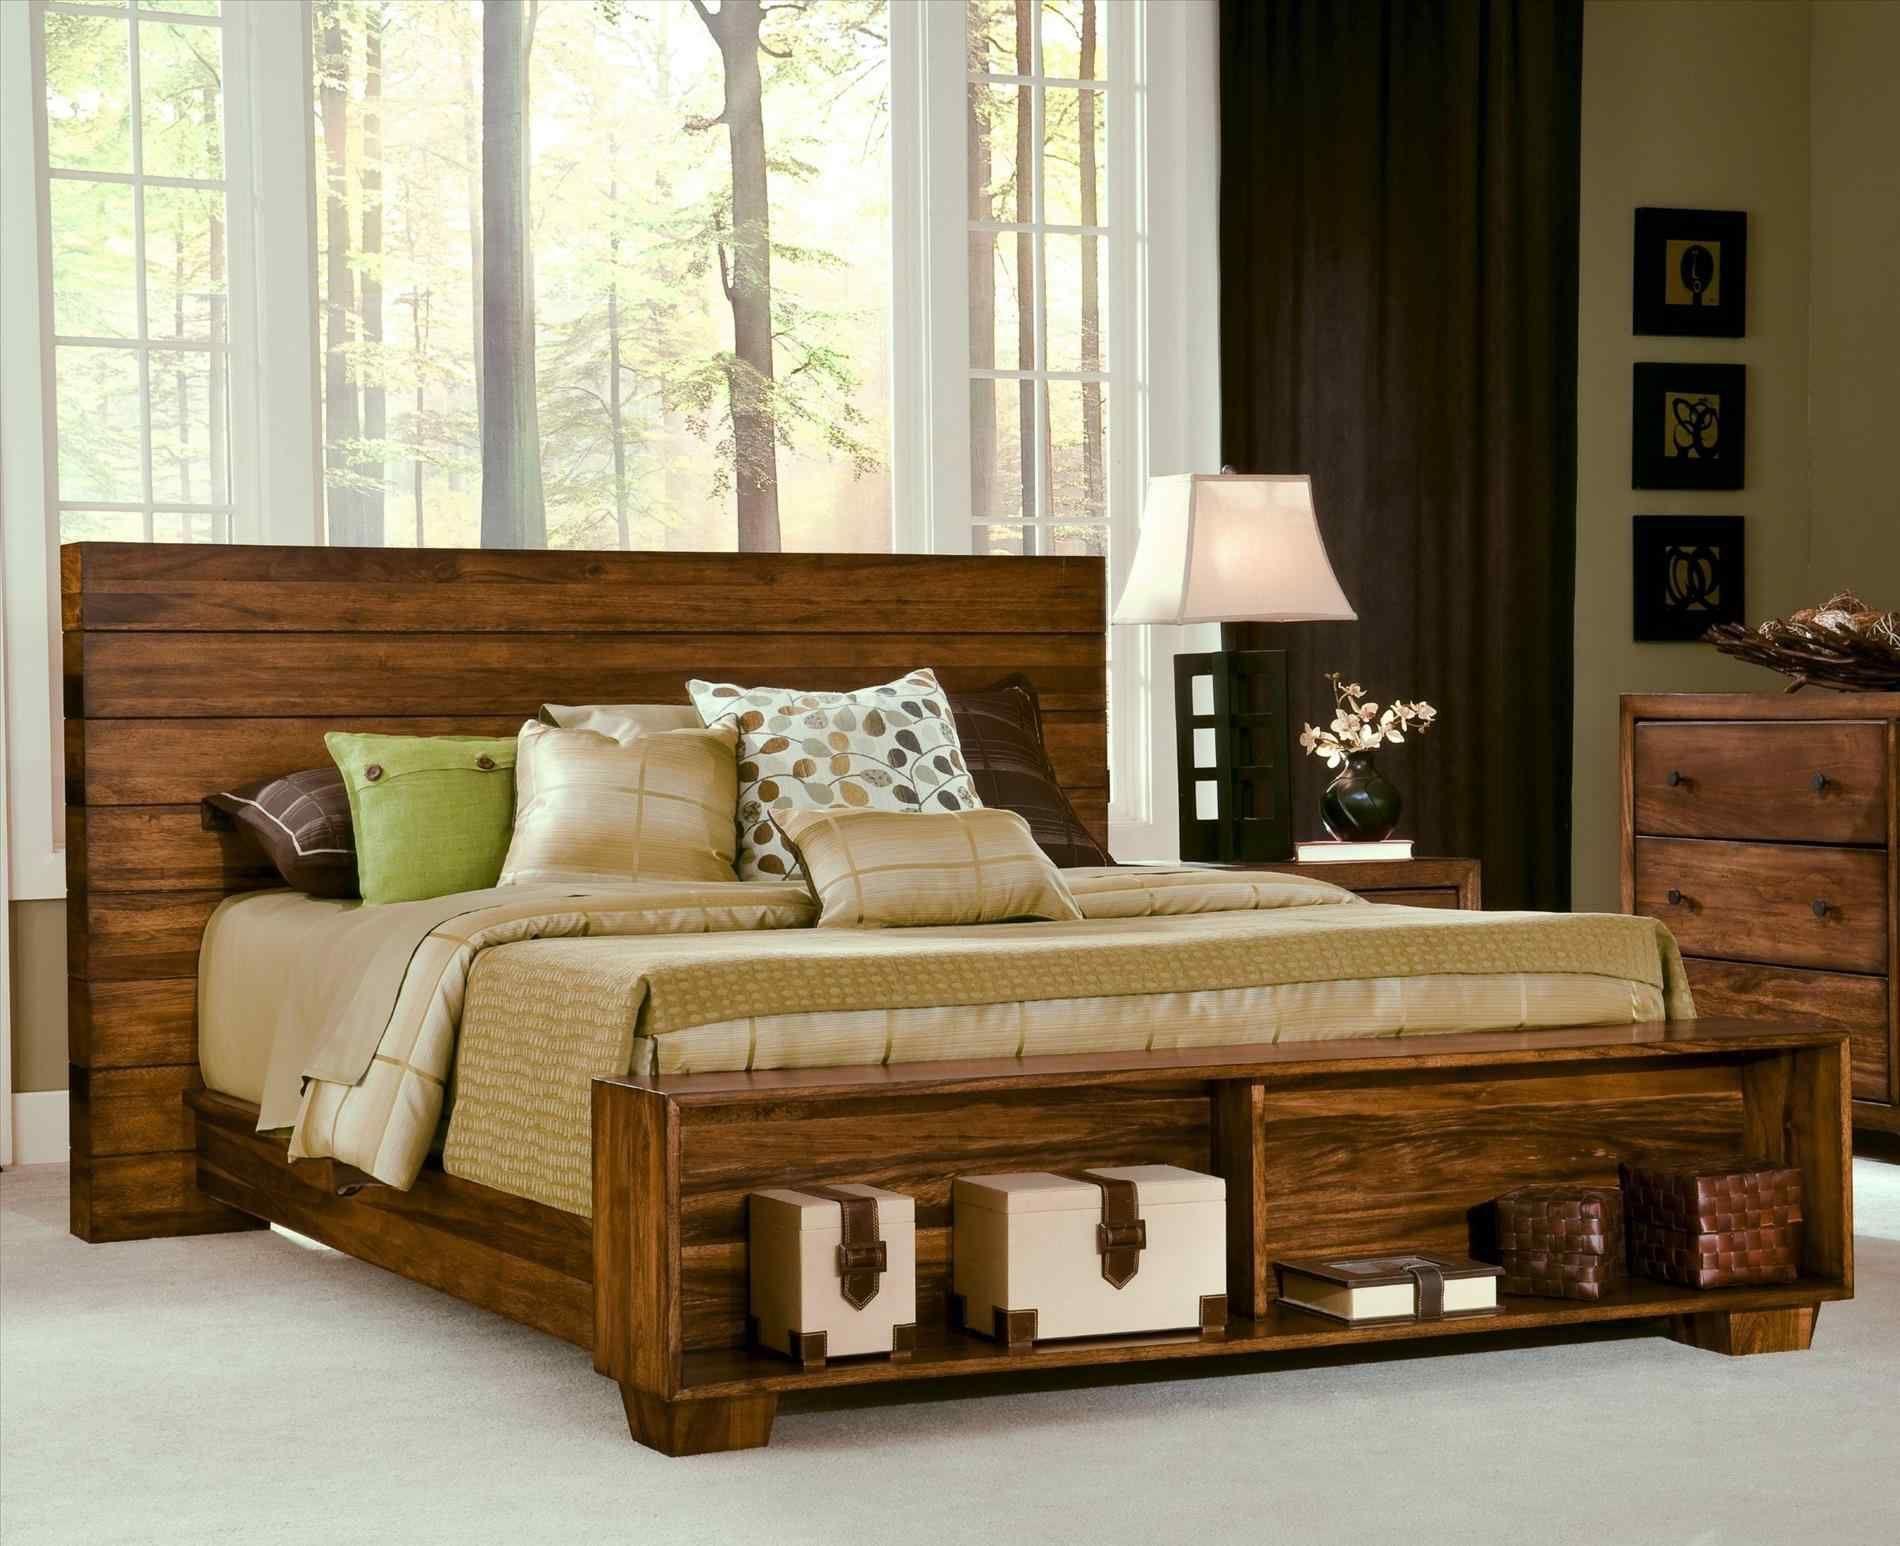 10 gorgeous contemporary california king bedroom sets ideas home rh pinterest com